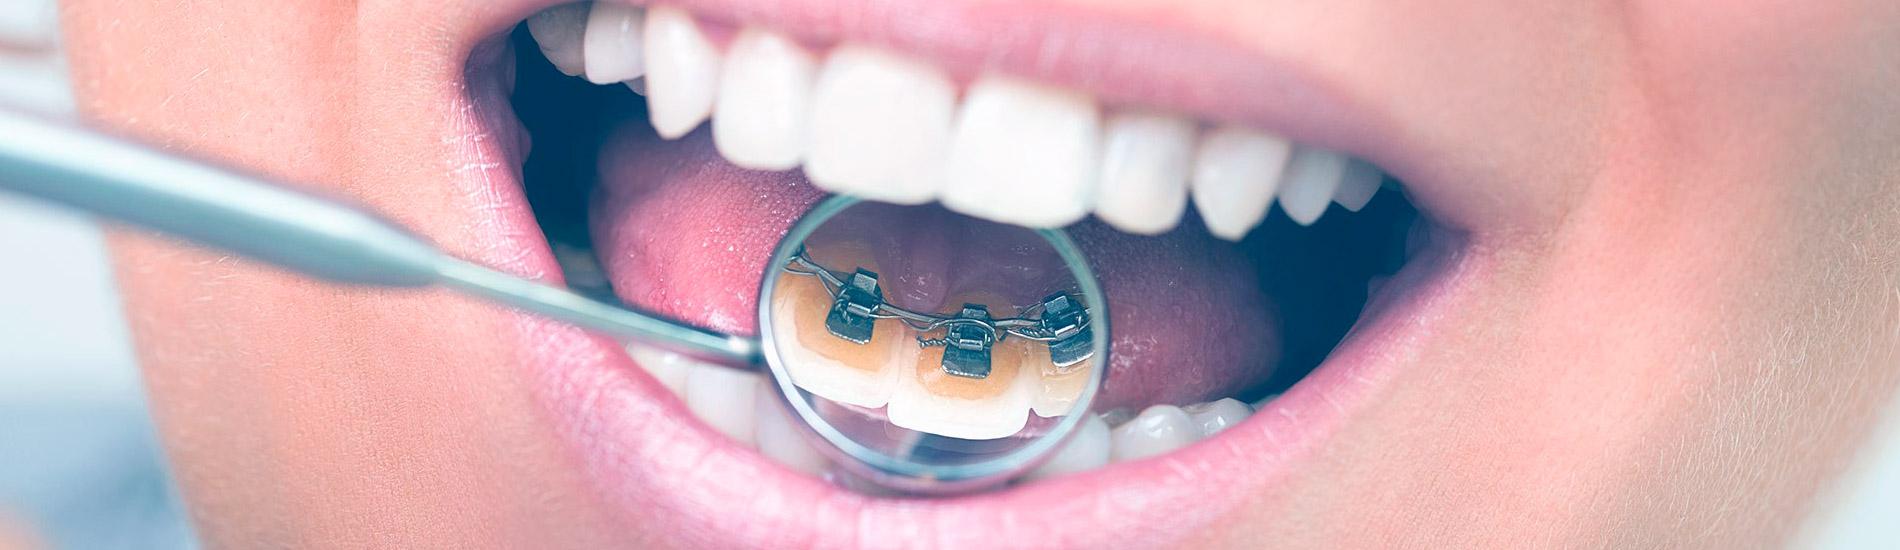 ortodoncia lingual granada